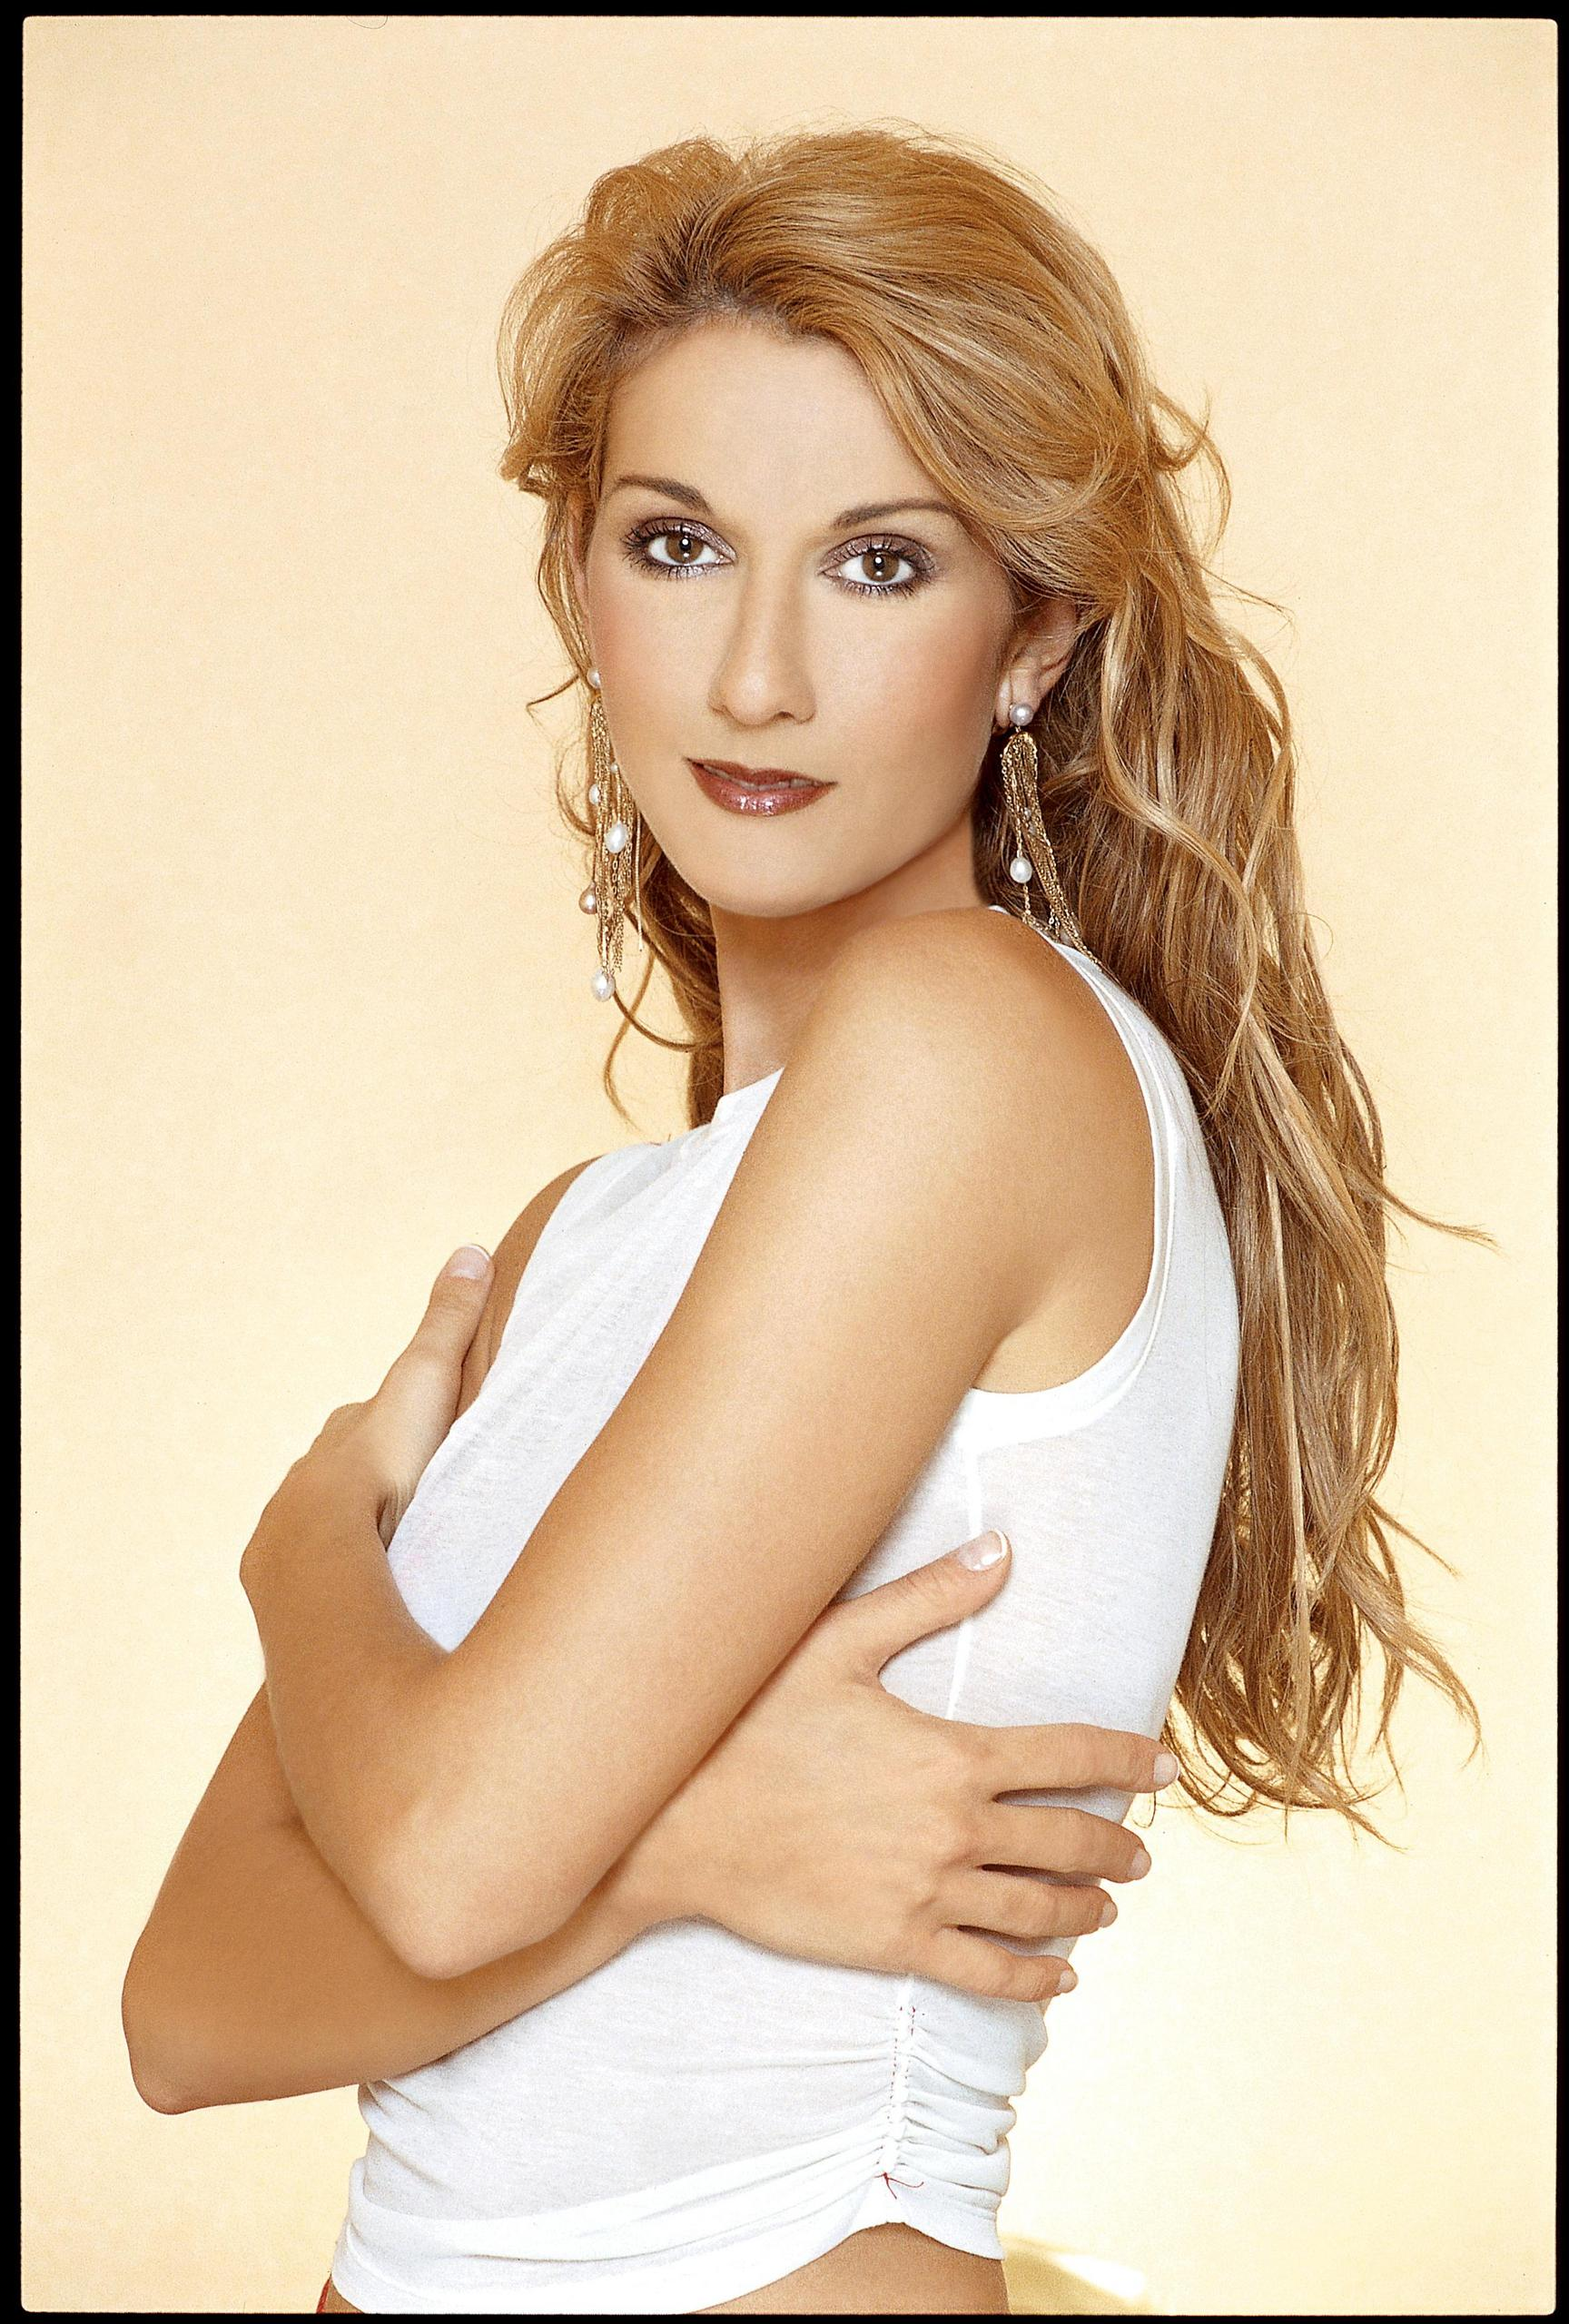 Celine Dion - Michel Marizy Photoshoot 2002